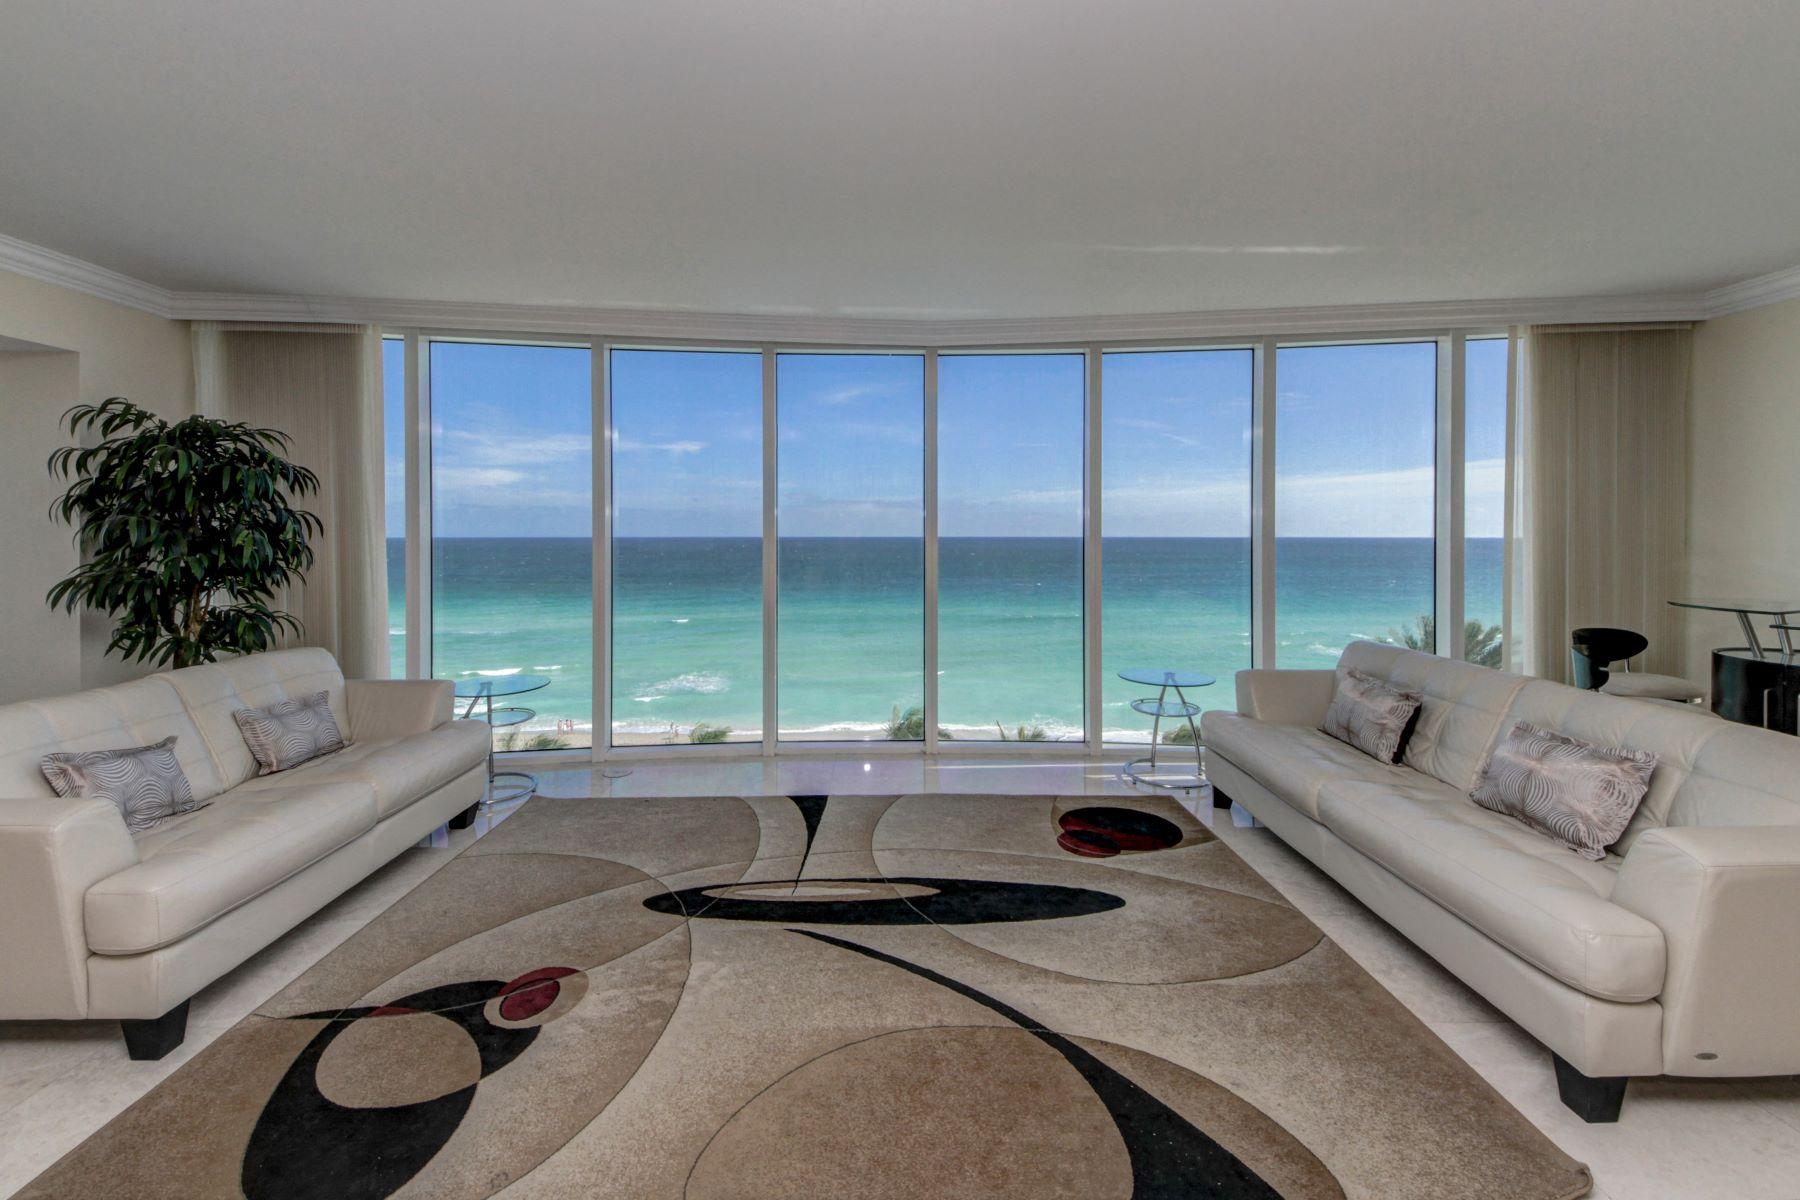 شقة بعمارة للـ Sale في 18911 Collins Ave #801 18911Collins Ave 801 Sunny Isles Beach, Florida, 33160 United States